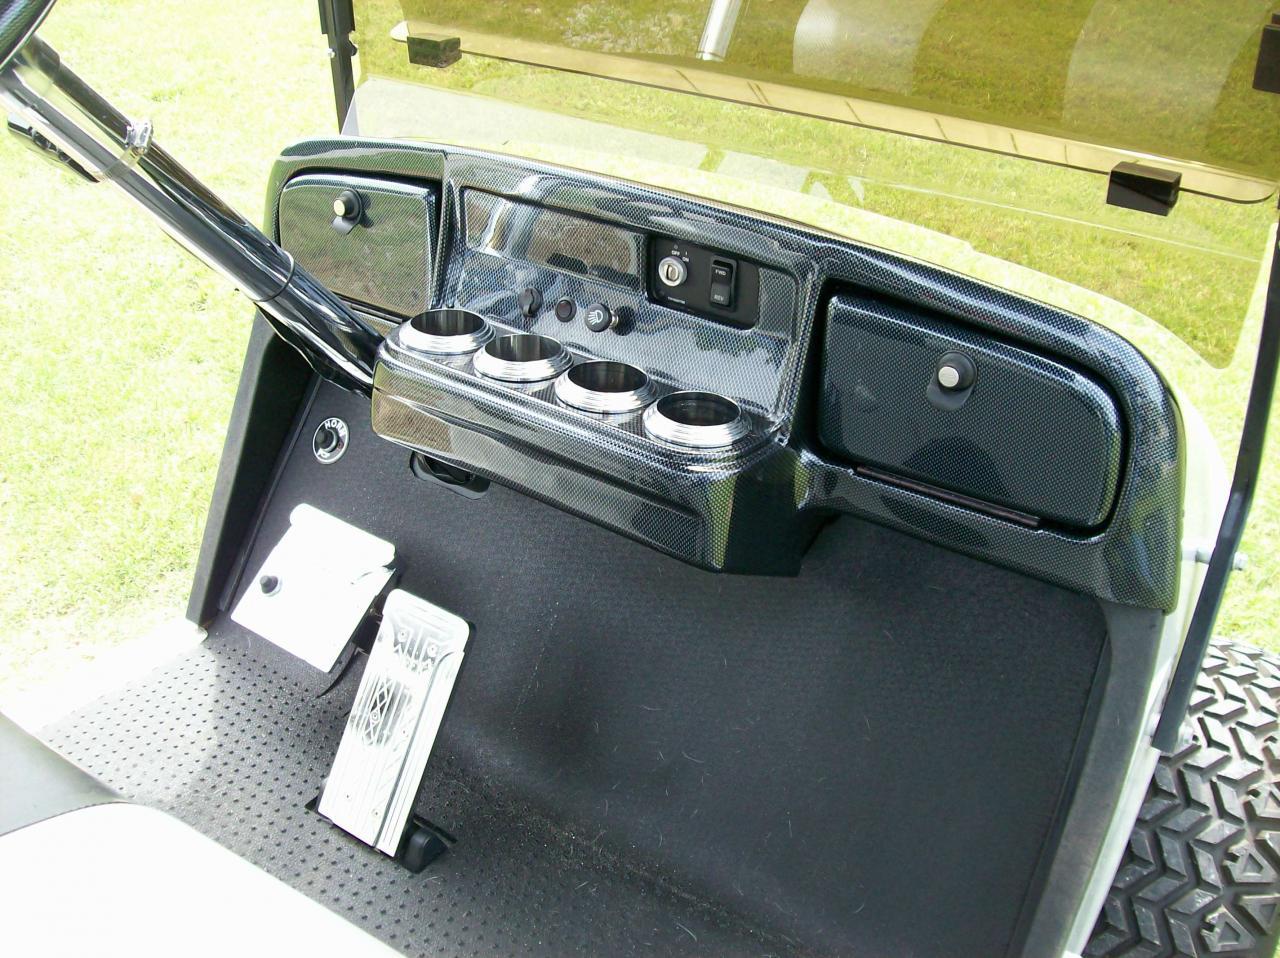 Customcarts in addition Golf Cart Museum Yamaha furthermore 281150662031 besides G2 Yamaha Golf Cart besides Yamaha Drive Three 3 Sided Vinyl Golf Cart Enclosure. on yamaha g14 golf cart